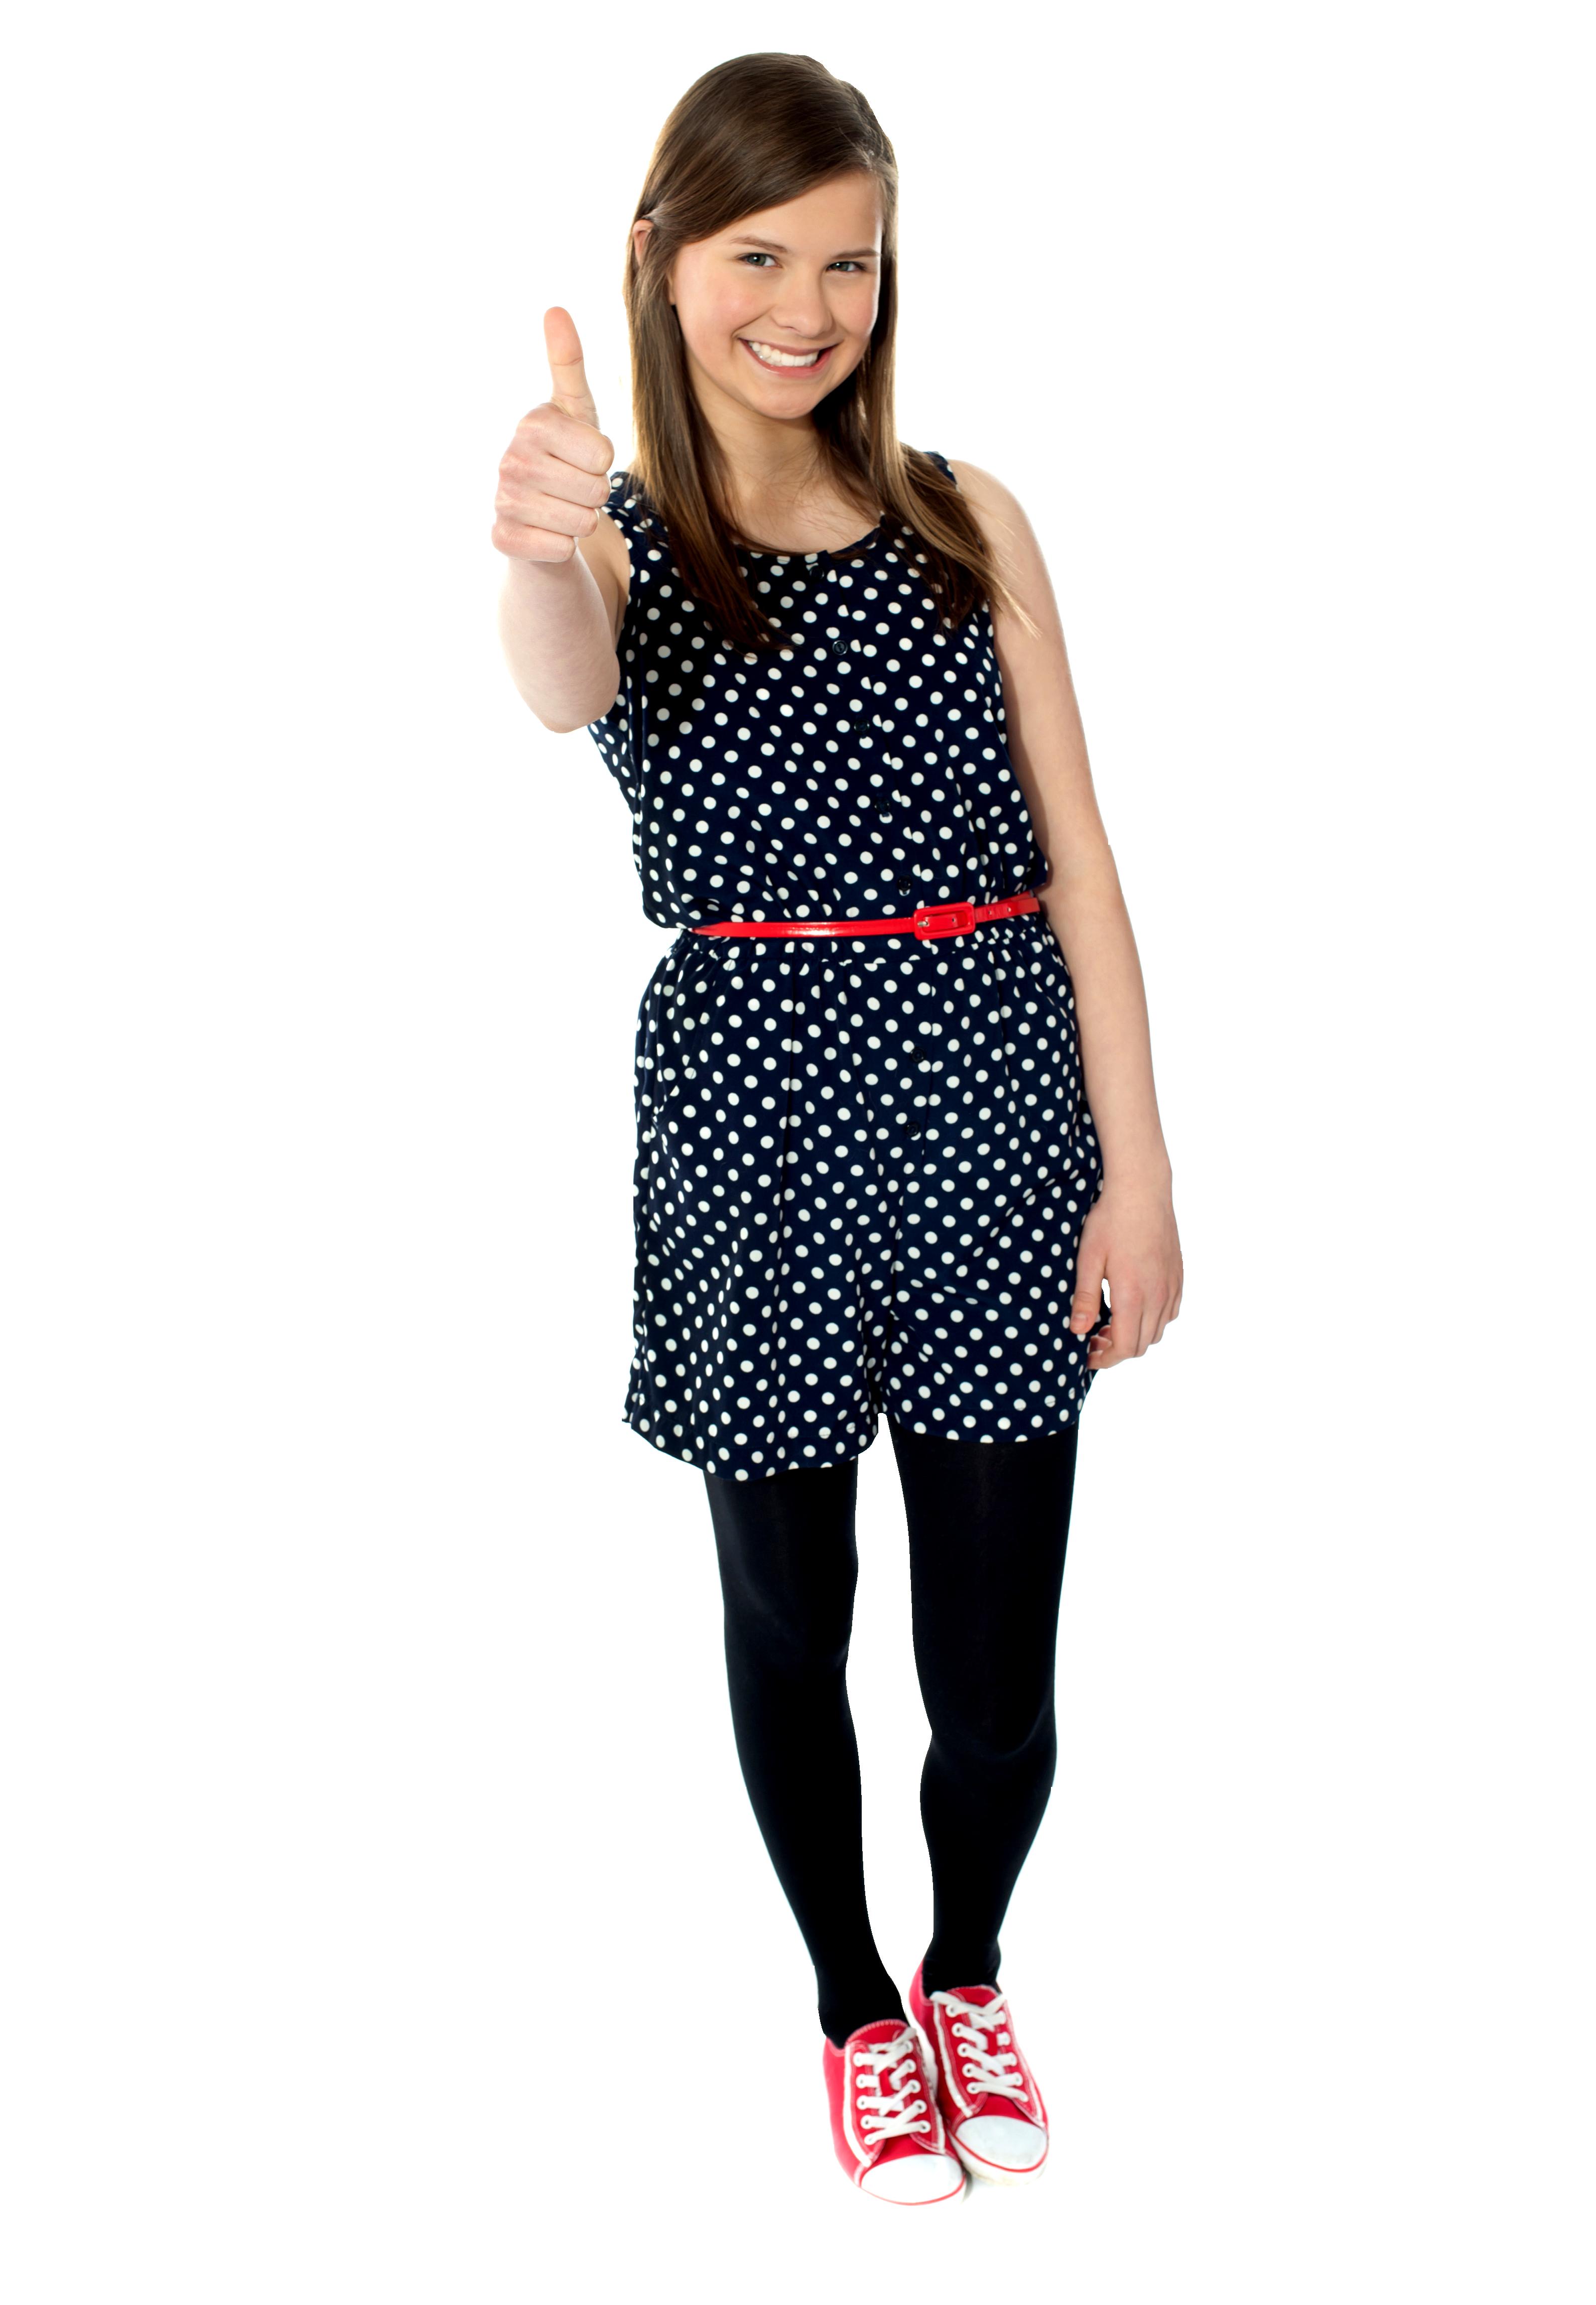 Cute Girl PNG Image